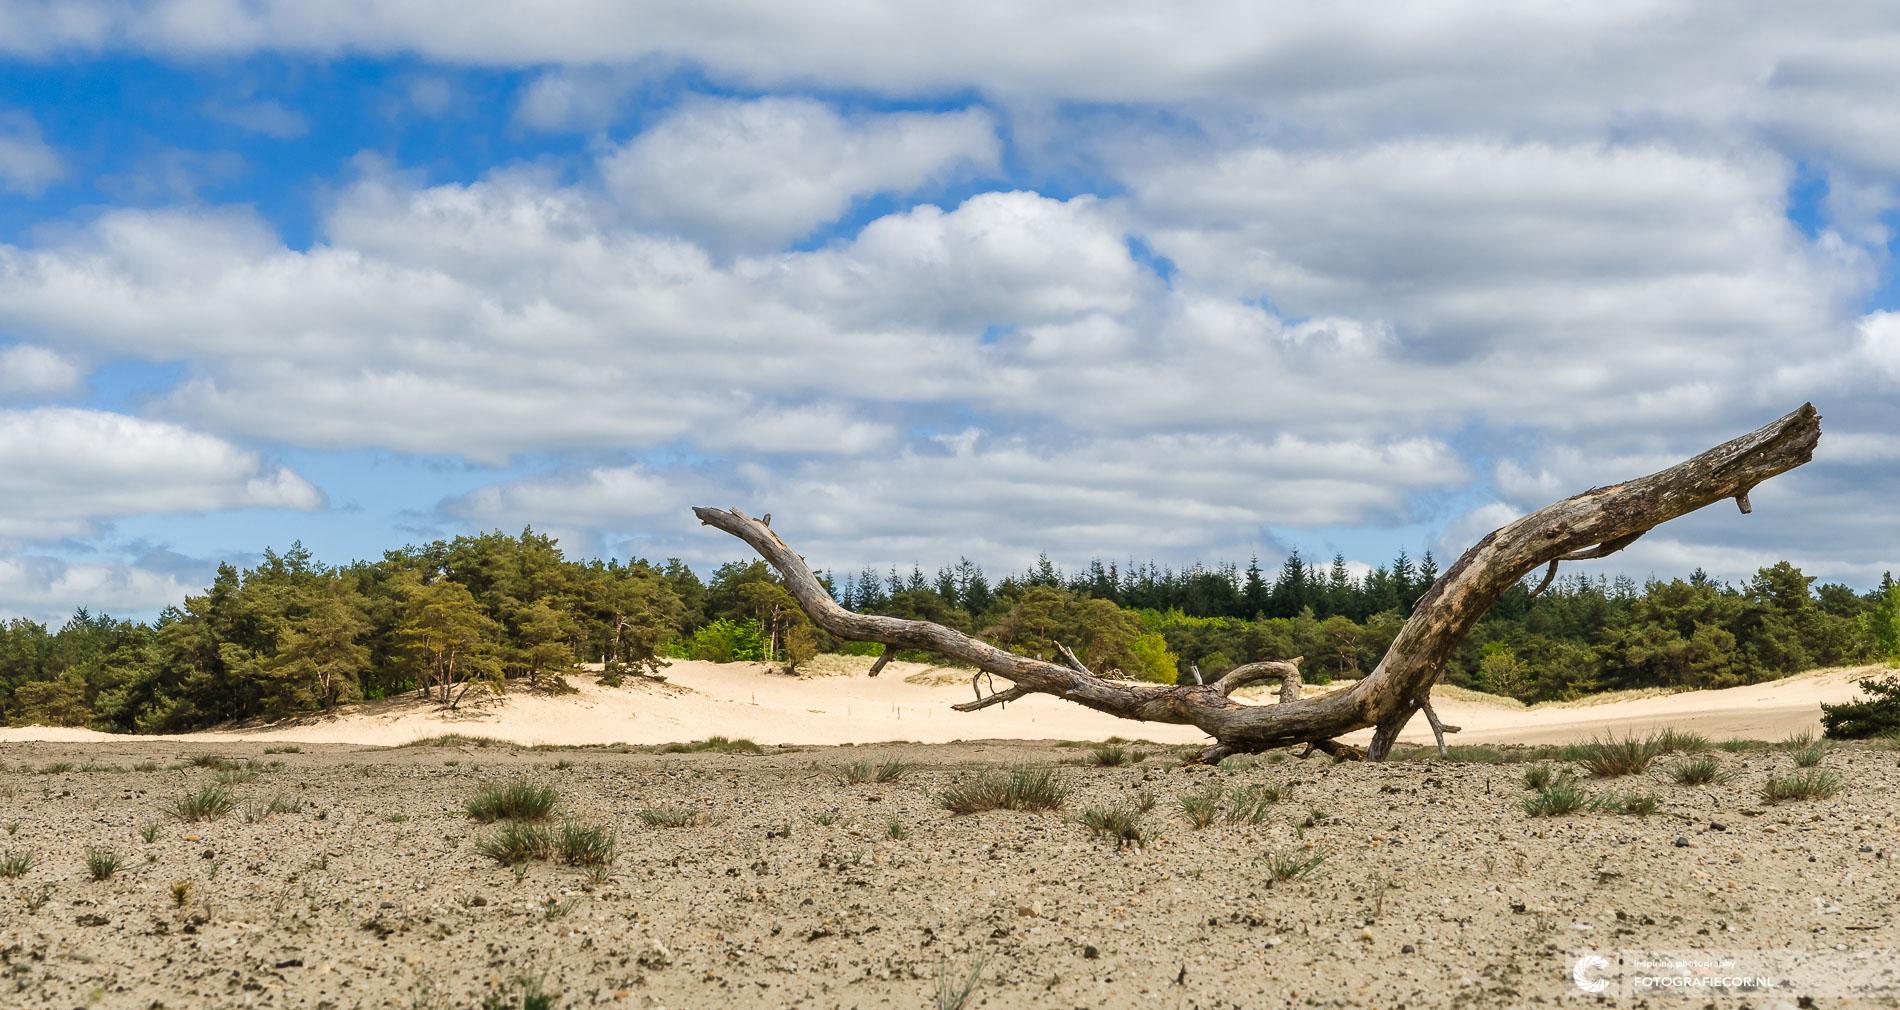 zandverstuiving Veluwe, Hulsthorsterzand Gelderland | Landschapsfotograaf